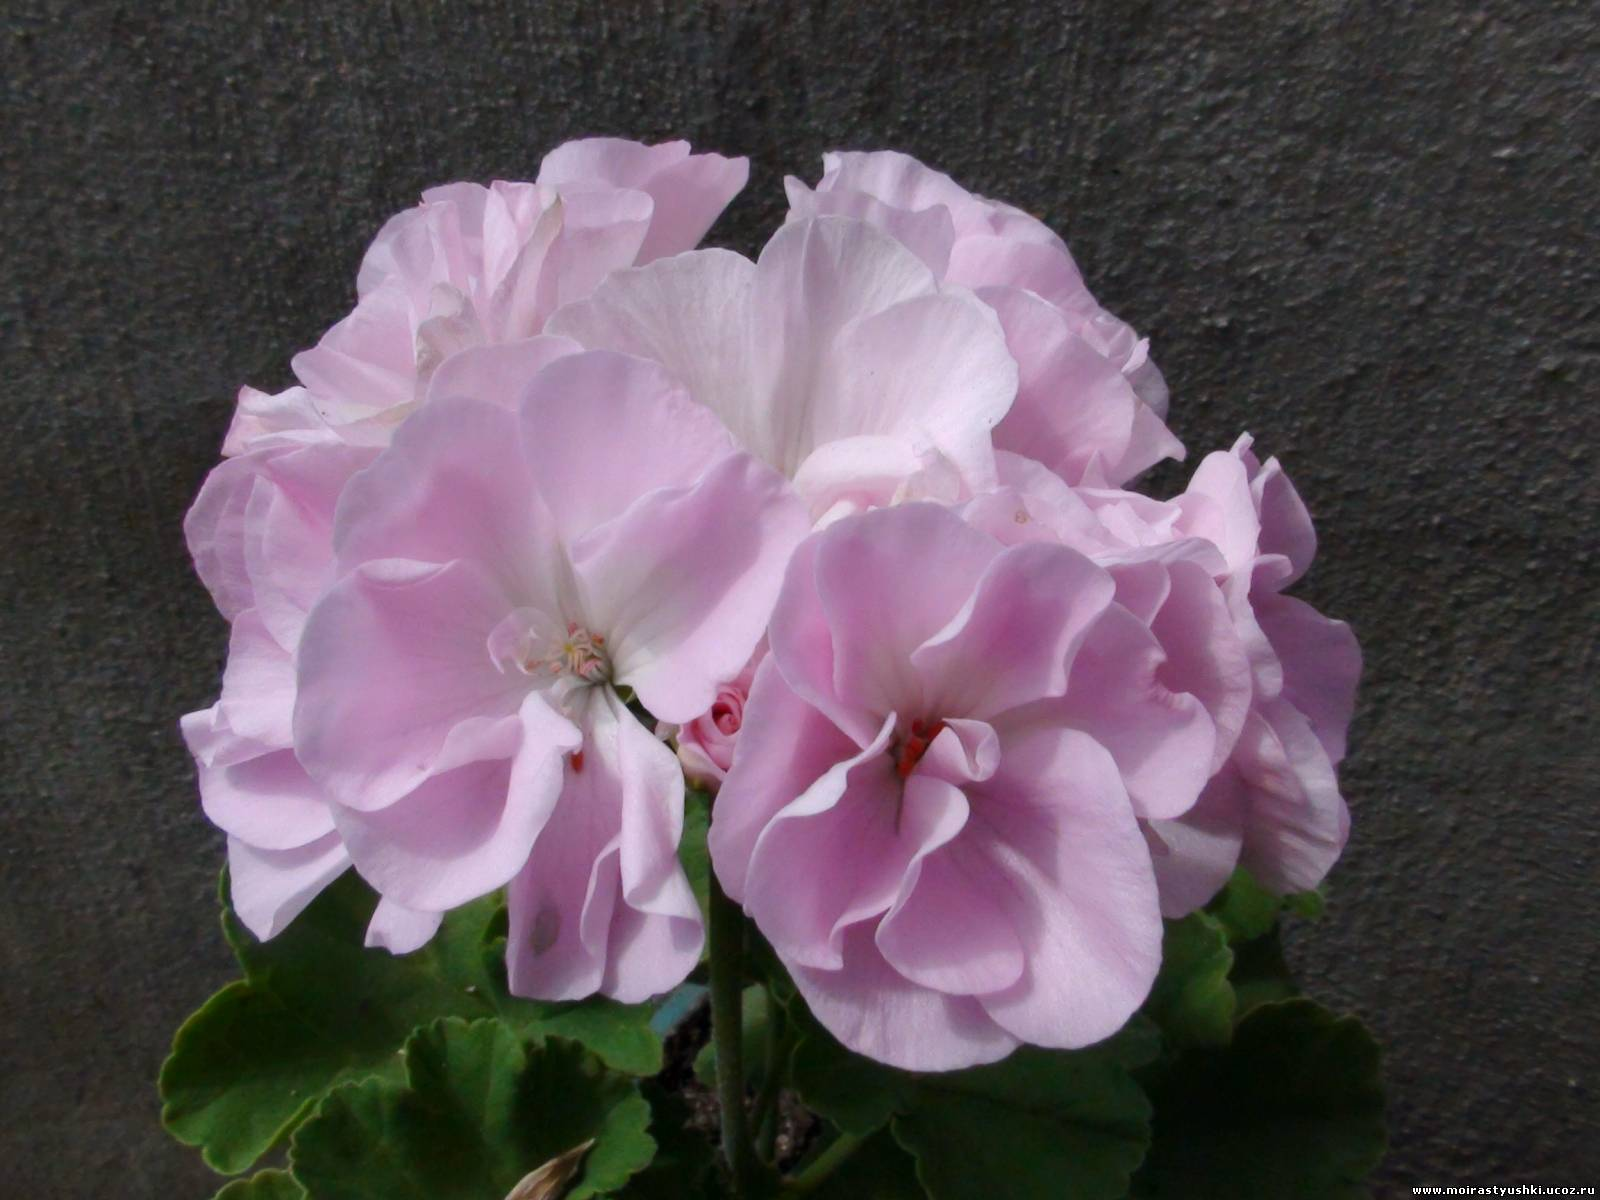 Moonlight violino фото цветов